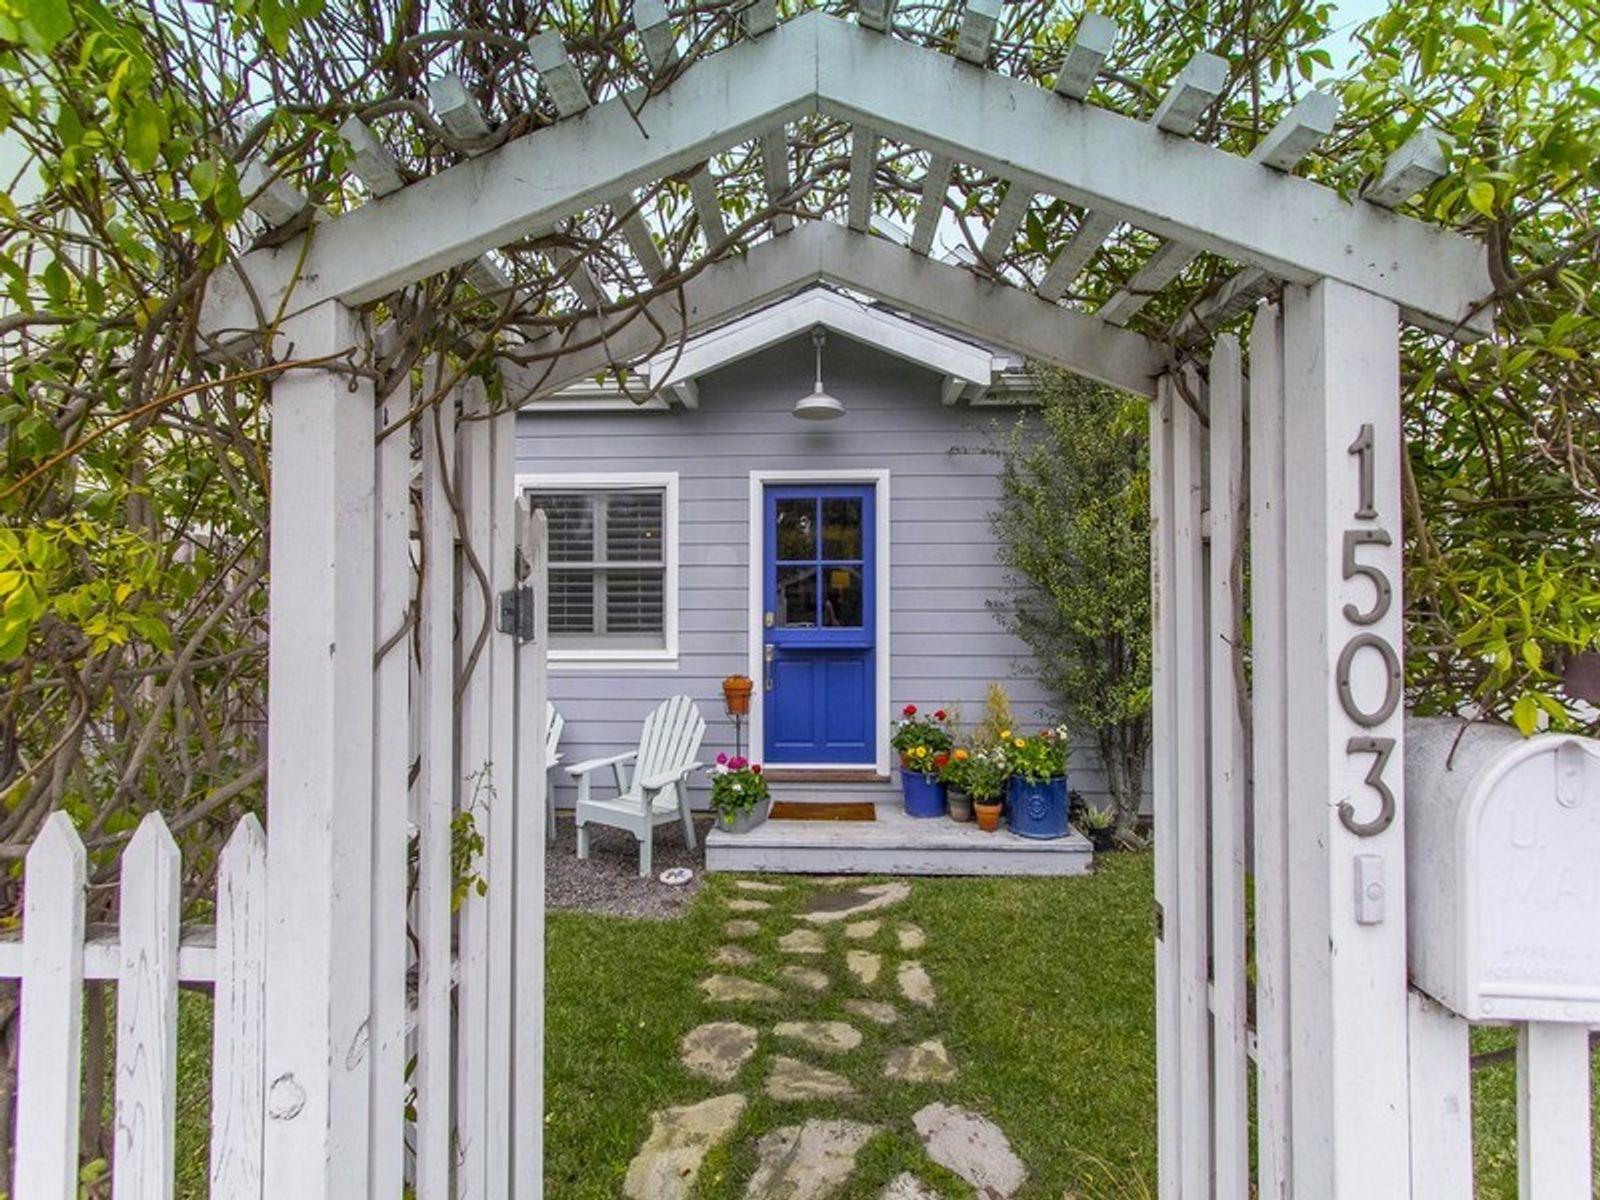 Two-Story Cape Cod Venice Beach House